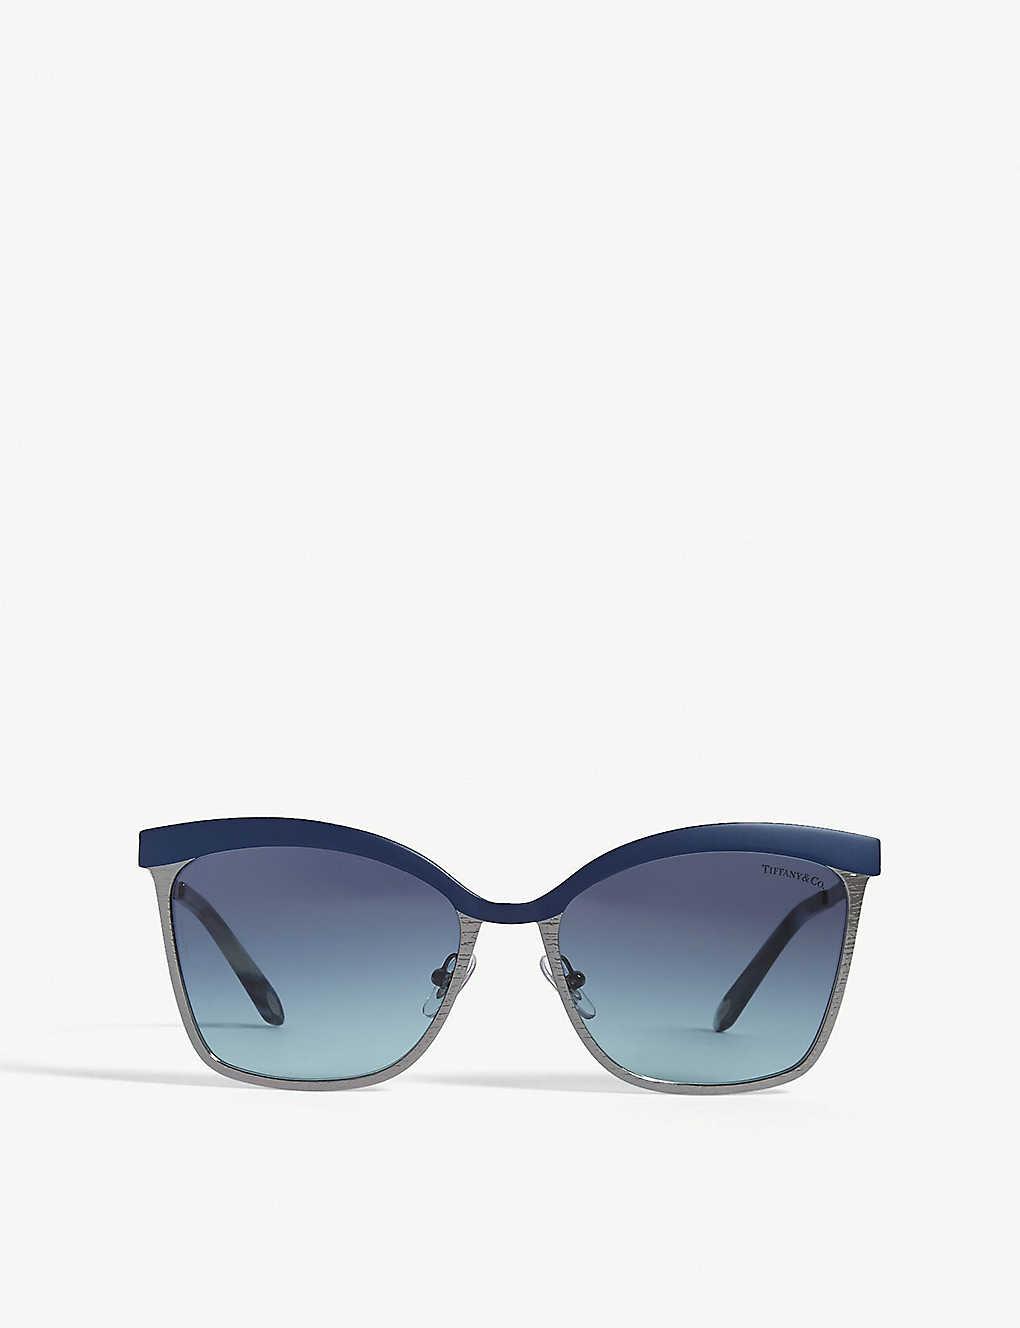 fc6365c75f8b TIFFANY & CO - Tf3060 square-frame sunglasses | Selfridges.com